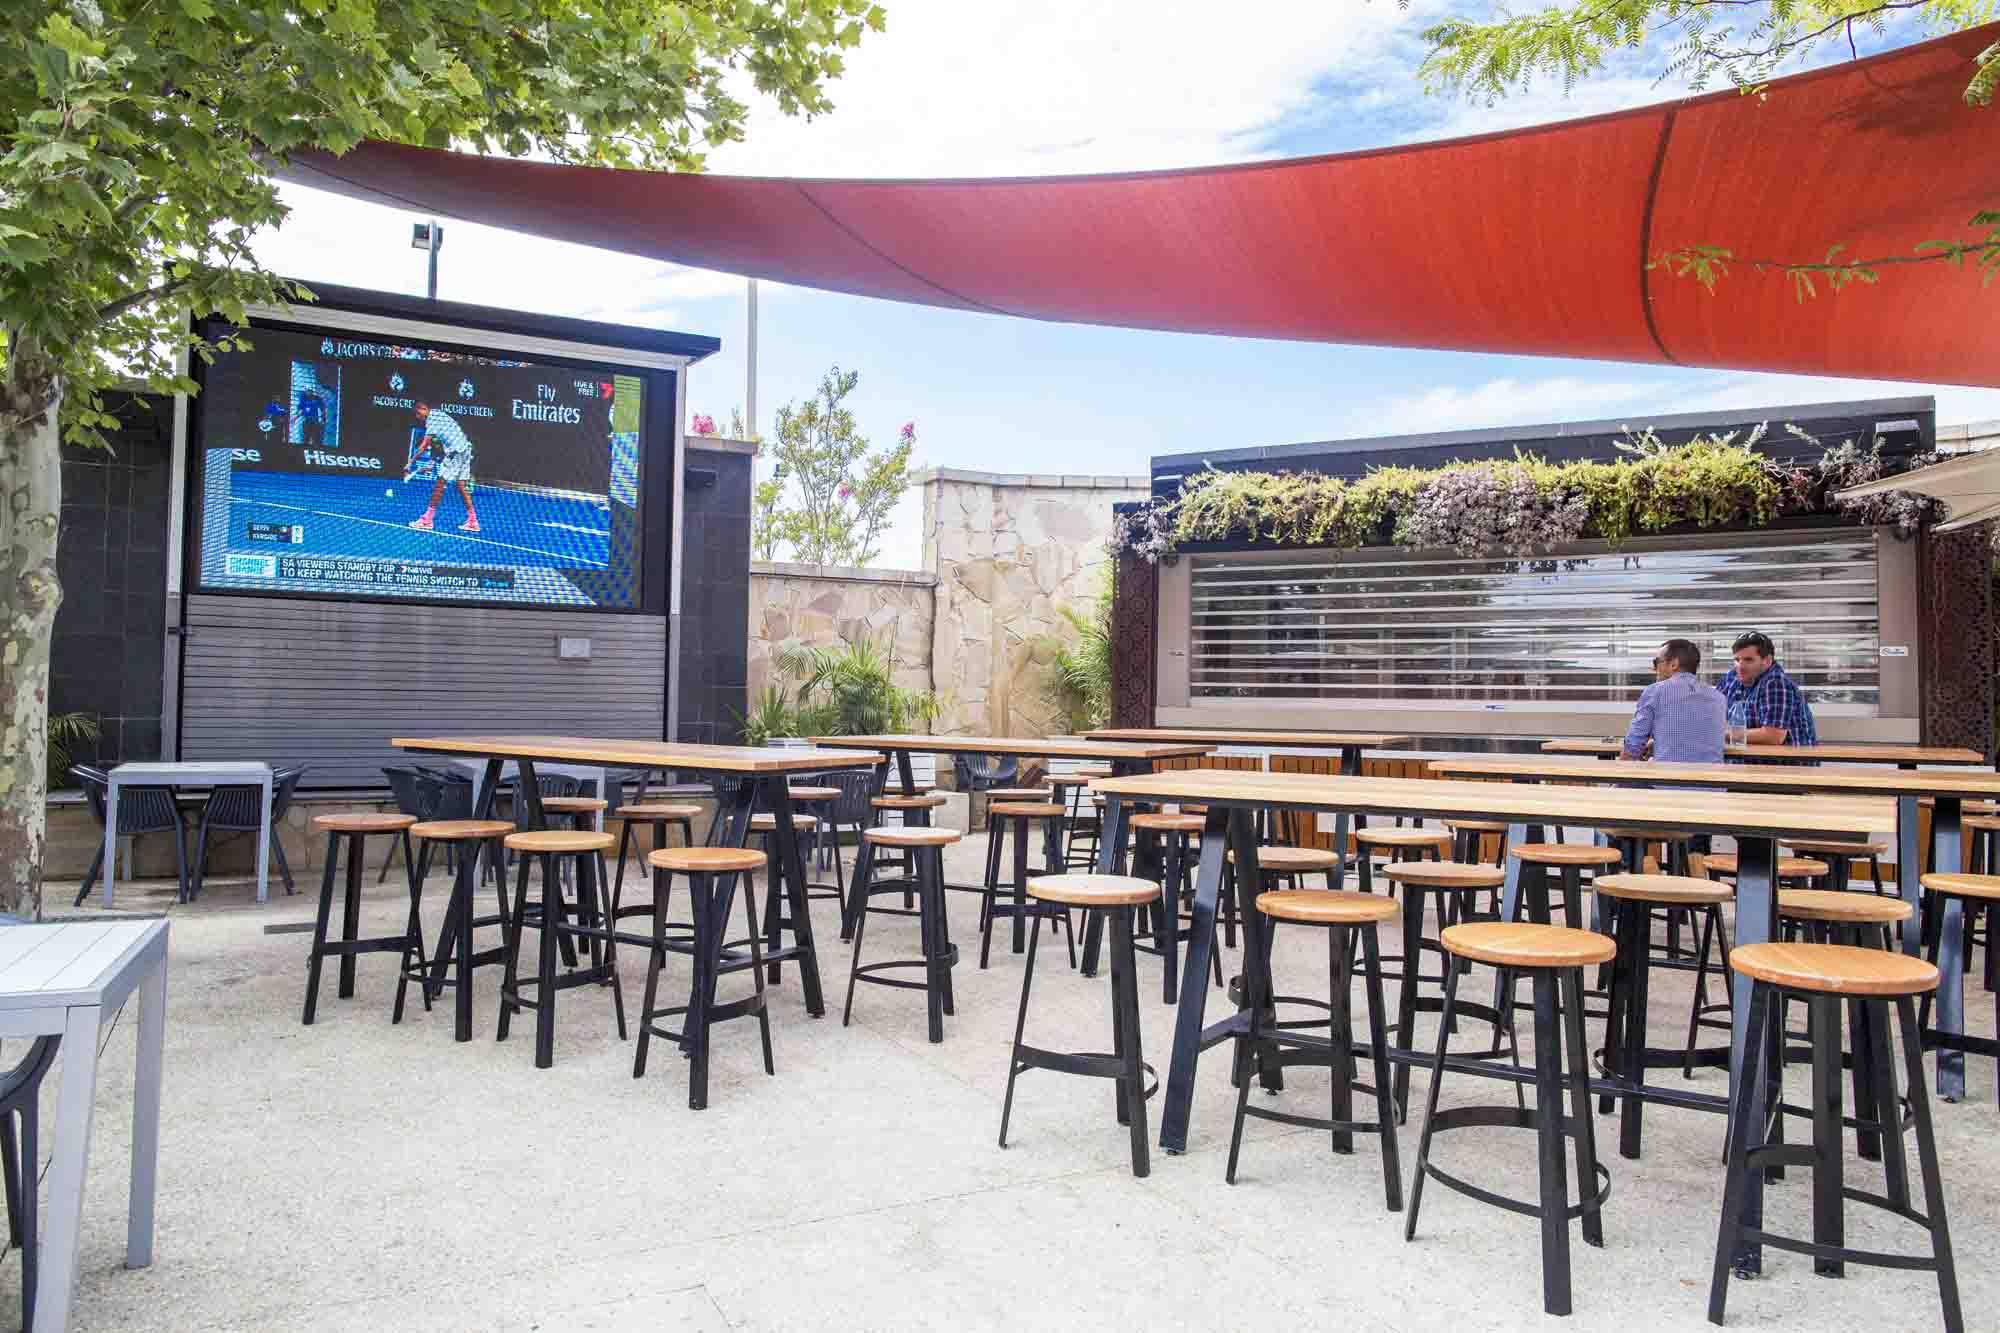 The-Gate-Bar-Success-Bars-Perth-Hidden-Laneway-Cocktail-Good-Outdoor-Pub-Sports-Garden-008.jpg